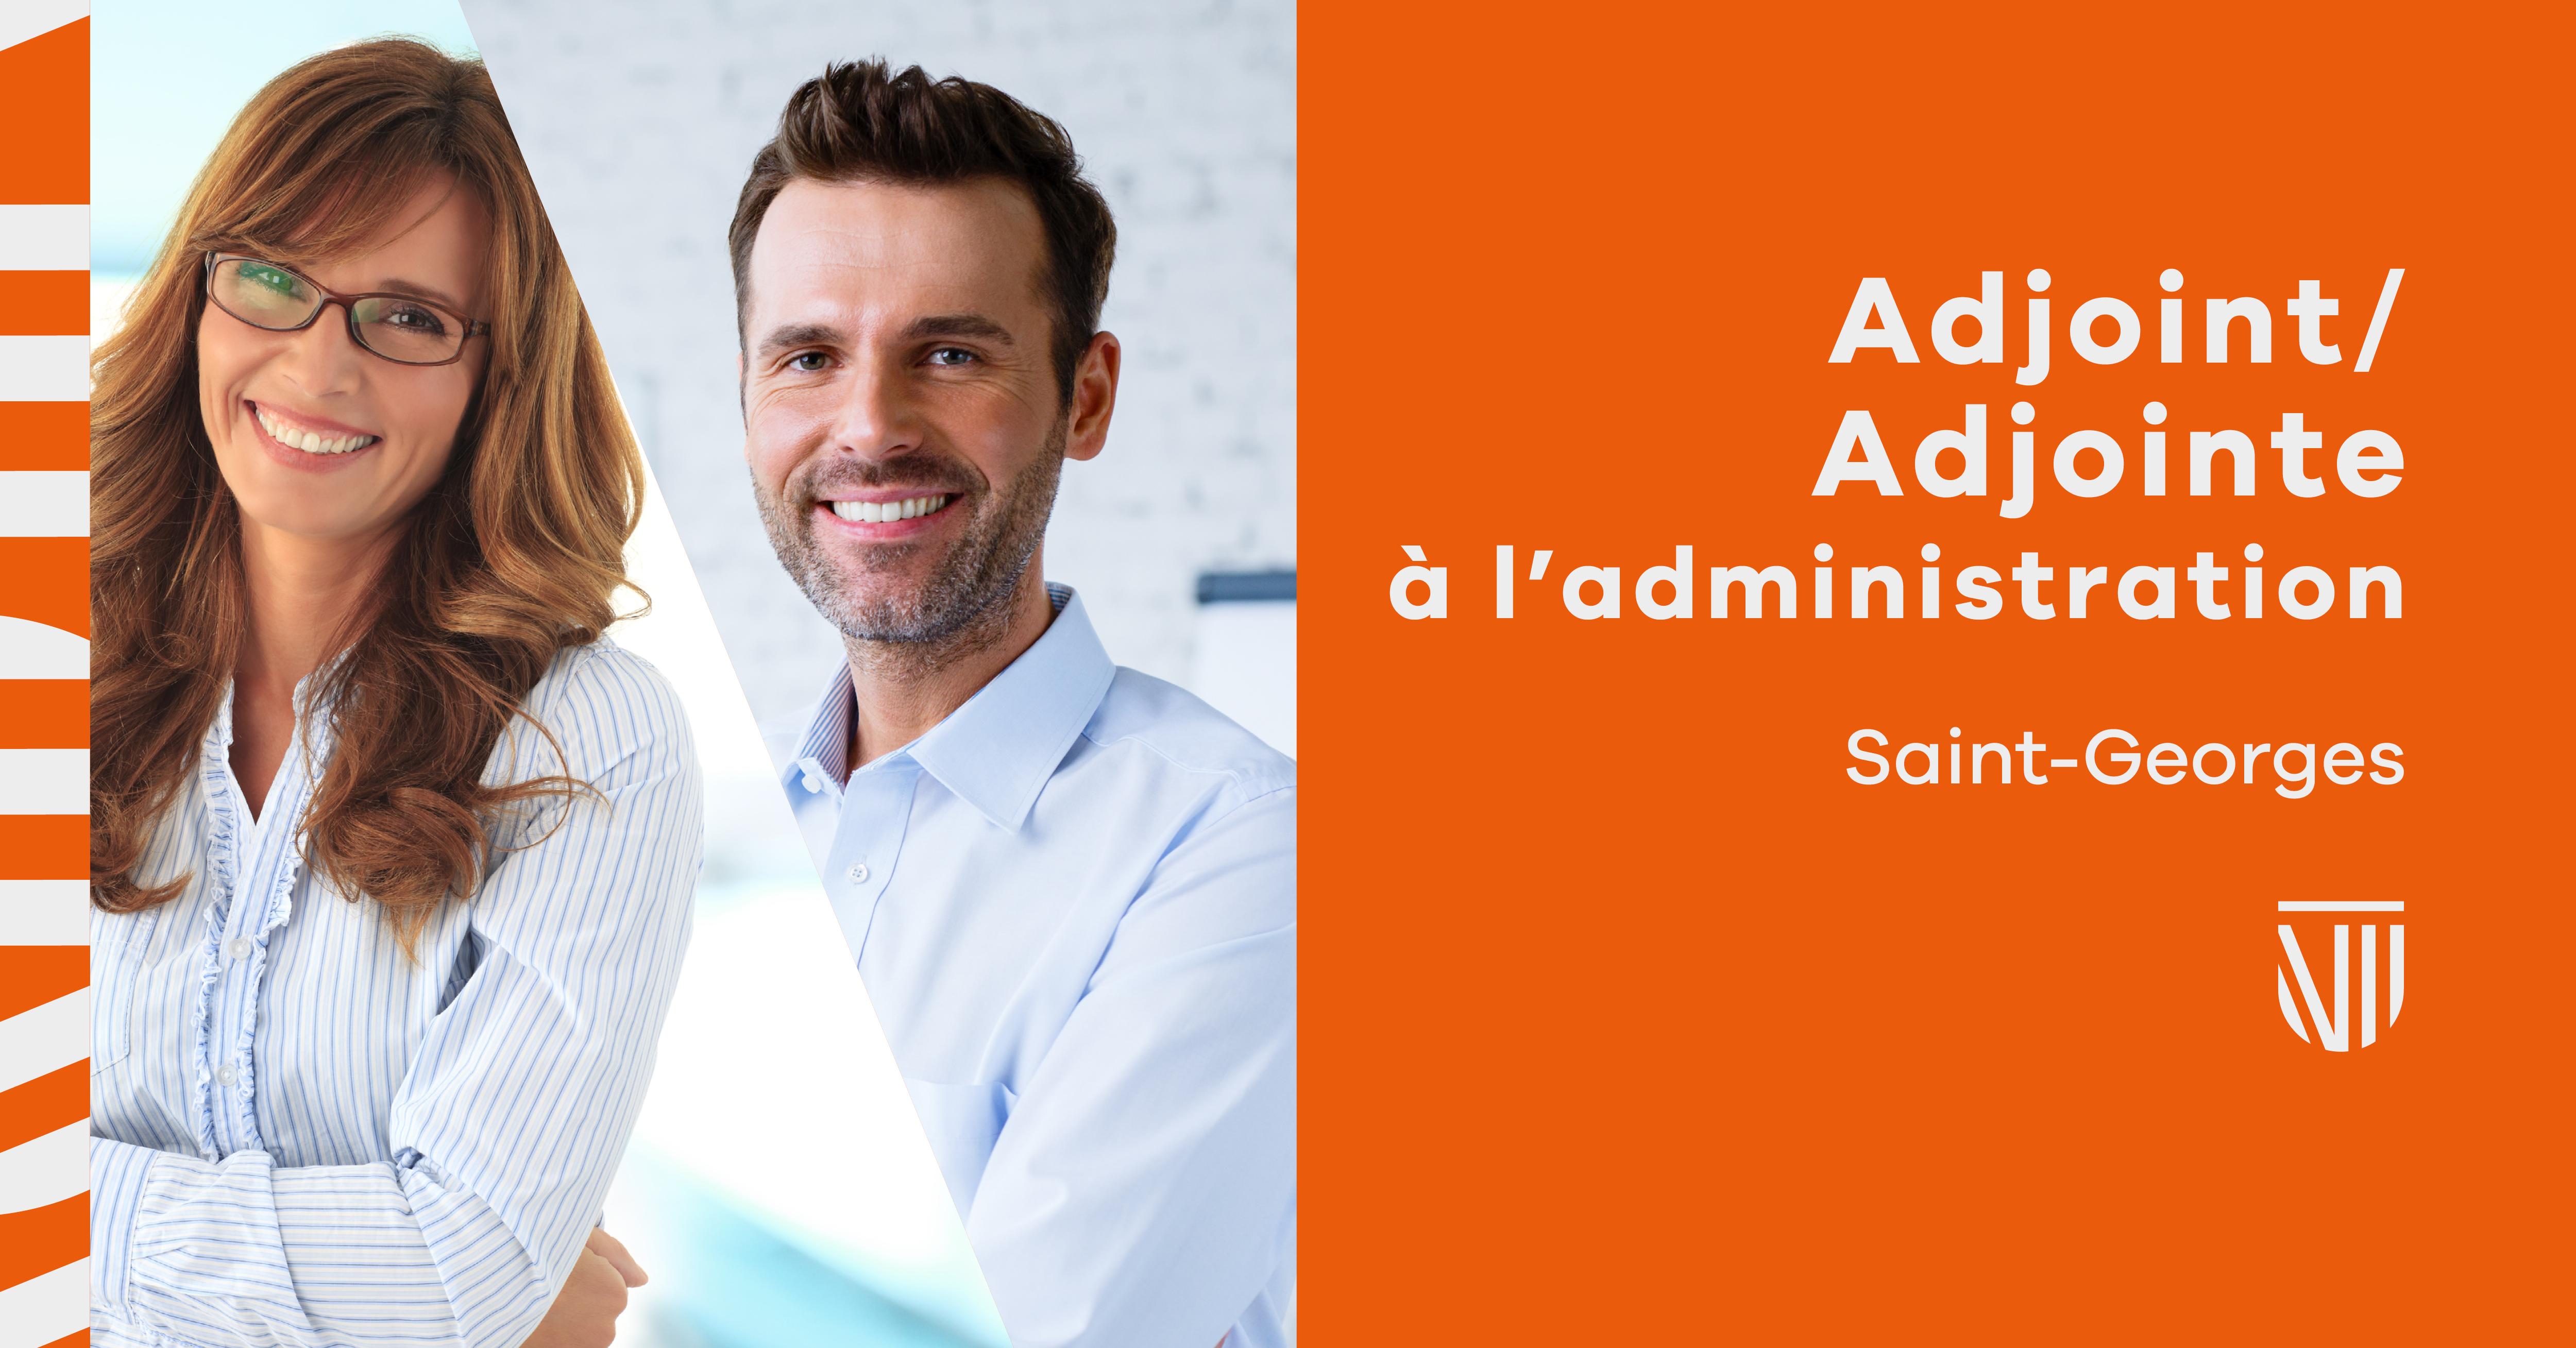 Adjoint/Adjointe à l'administration